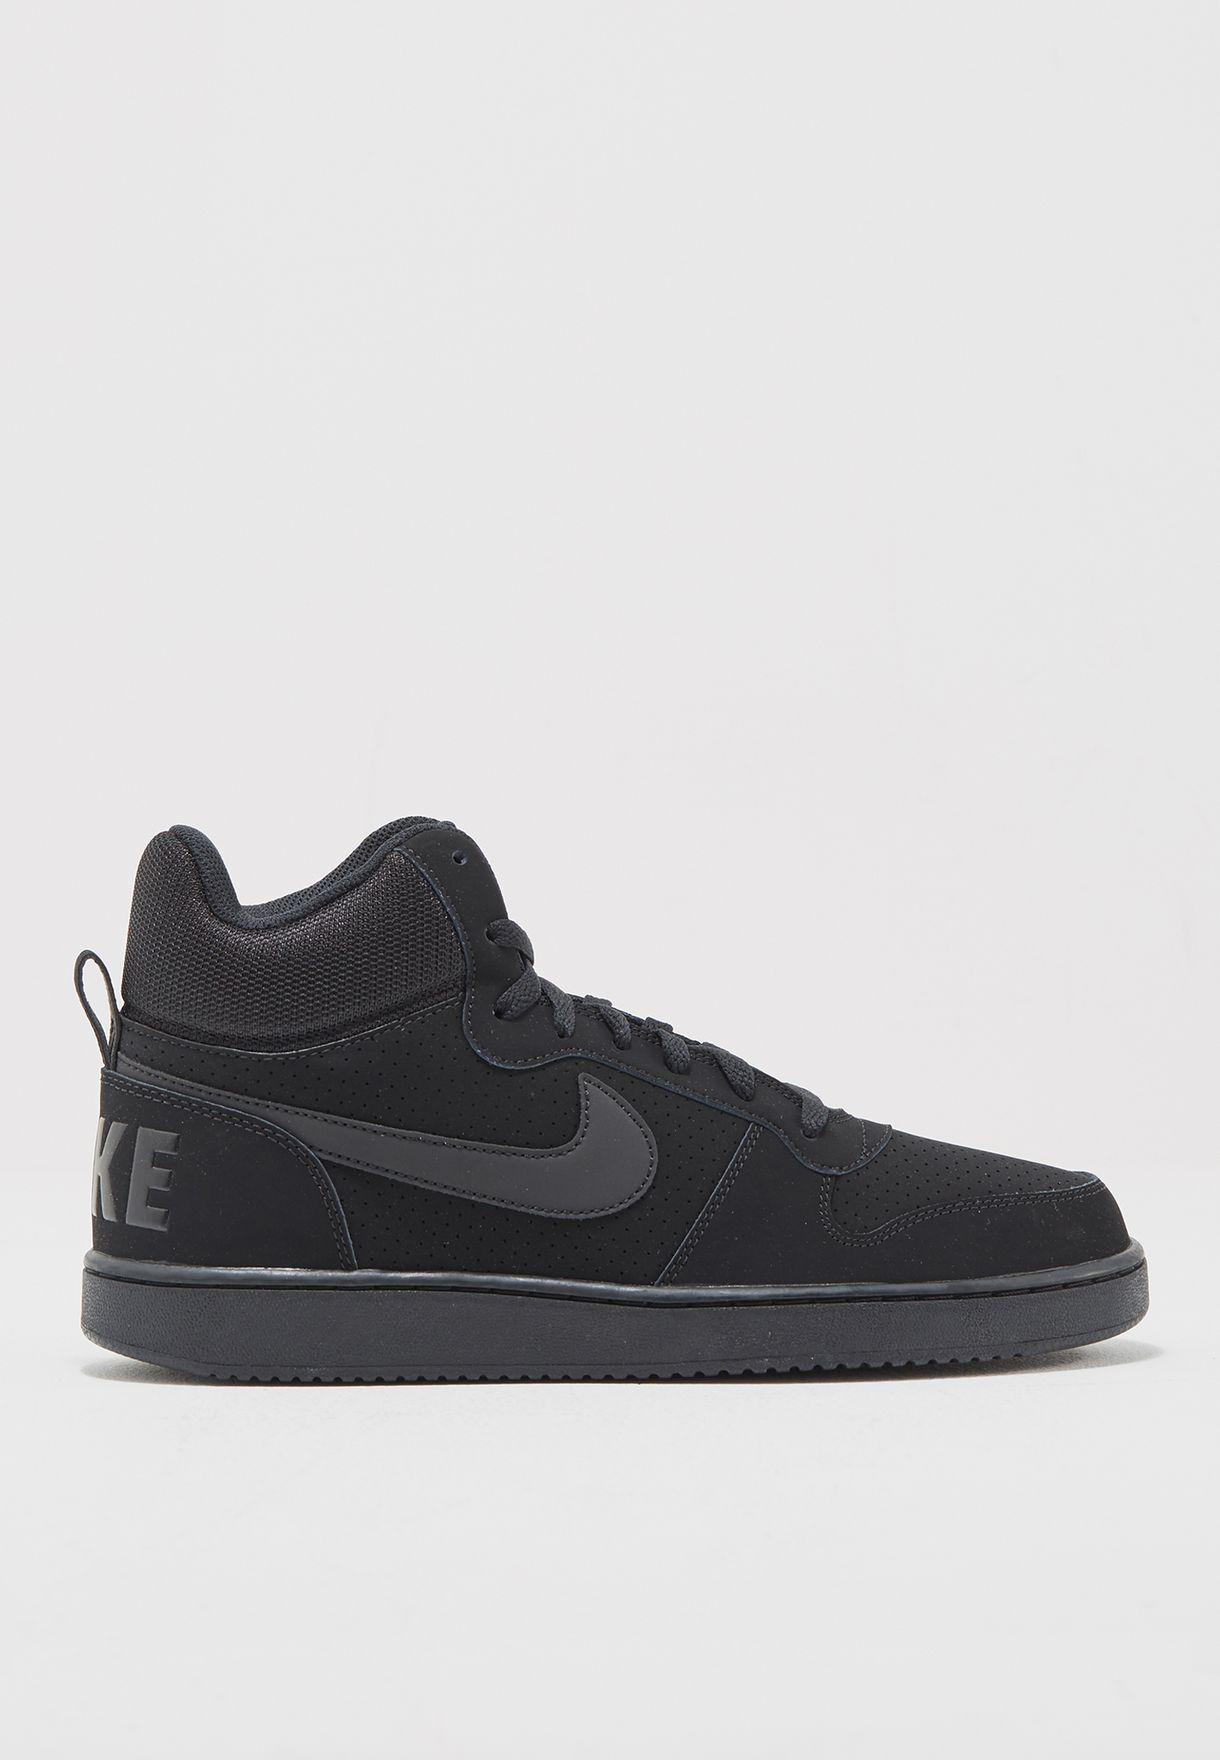 39c09f248f7ff0 Shop Nike black Court Borough Mid 838938-003 for Men in UAE ...